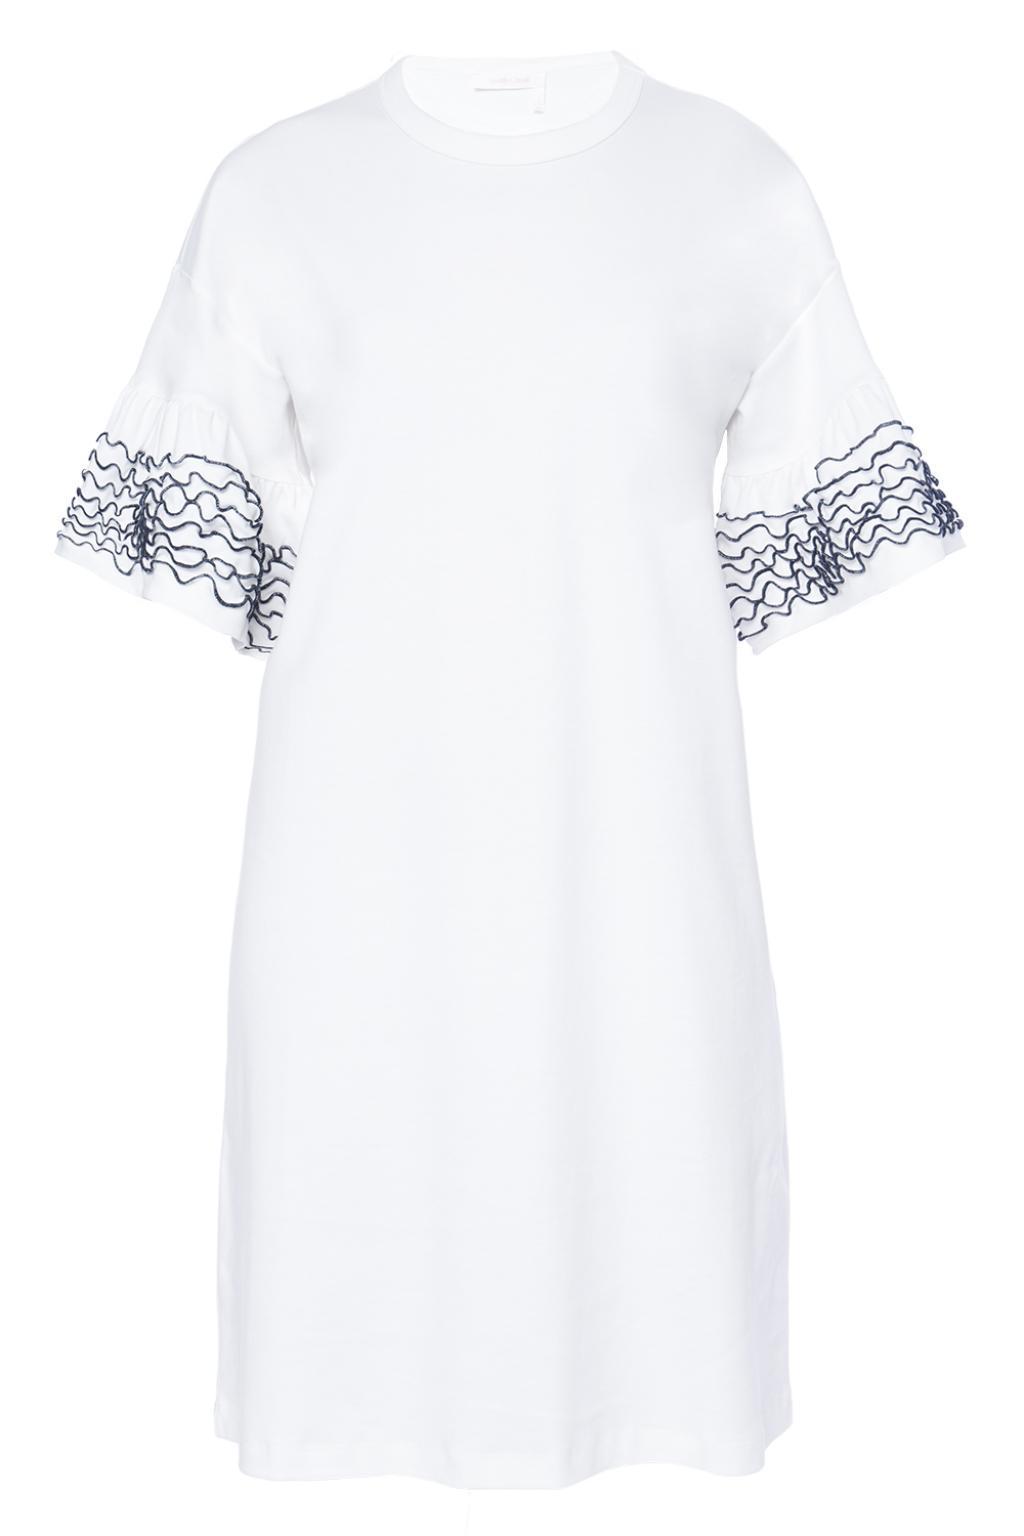 flared patterned dress - Black See By Chlo gK4LAebw